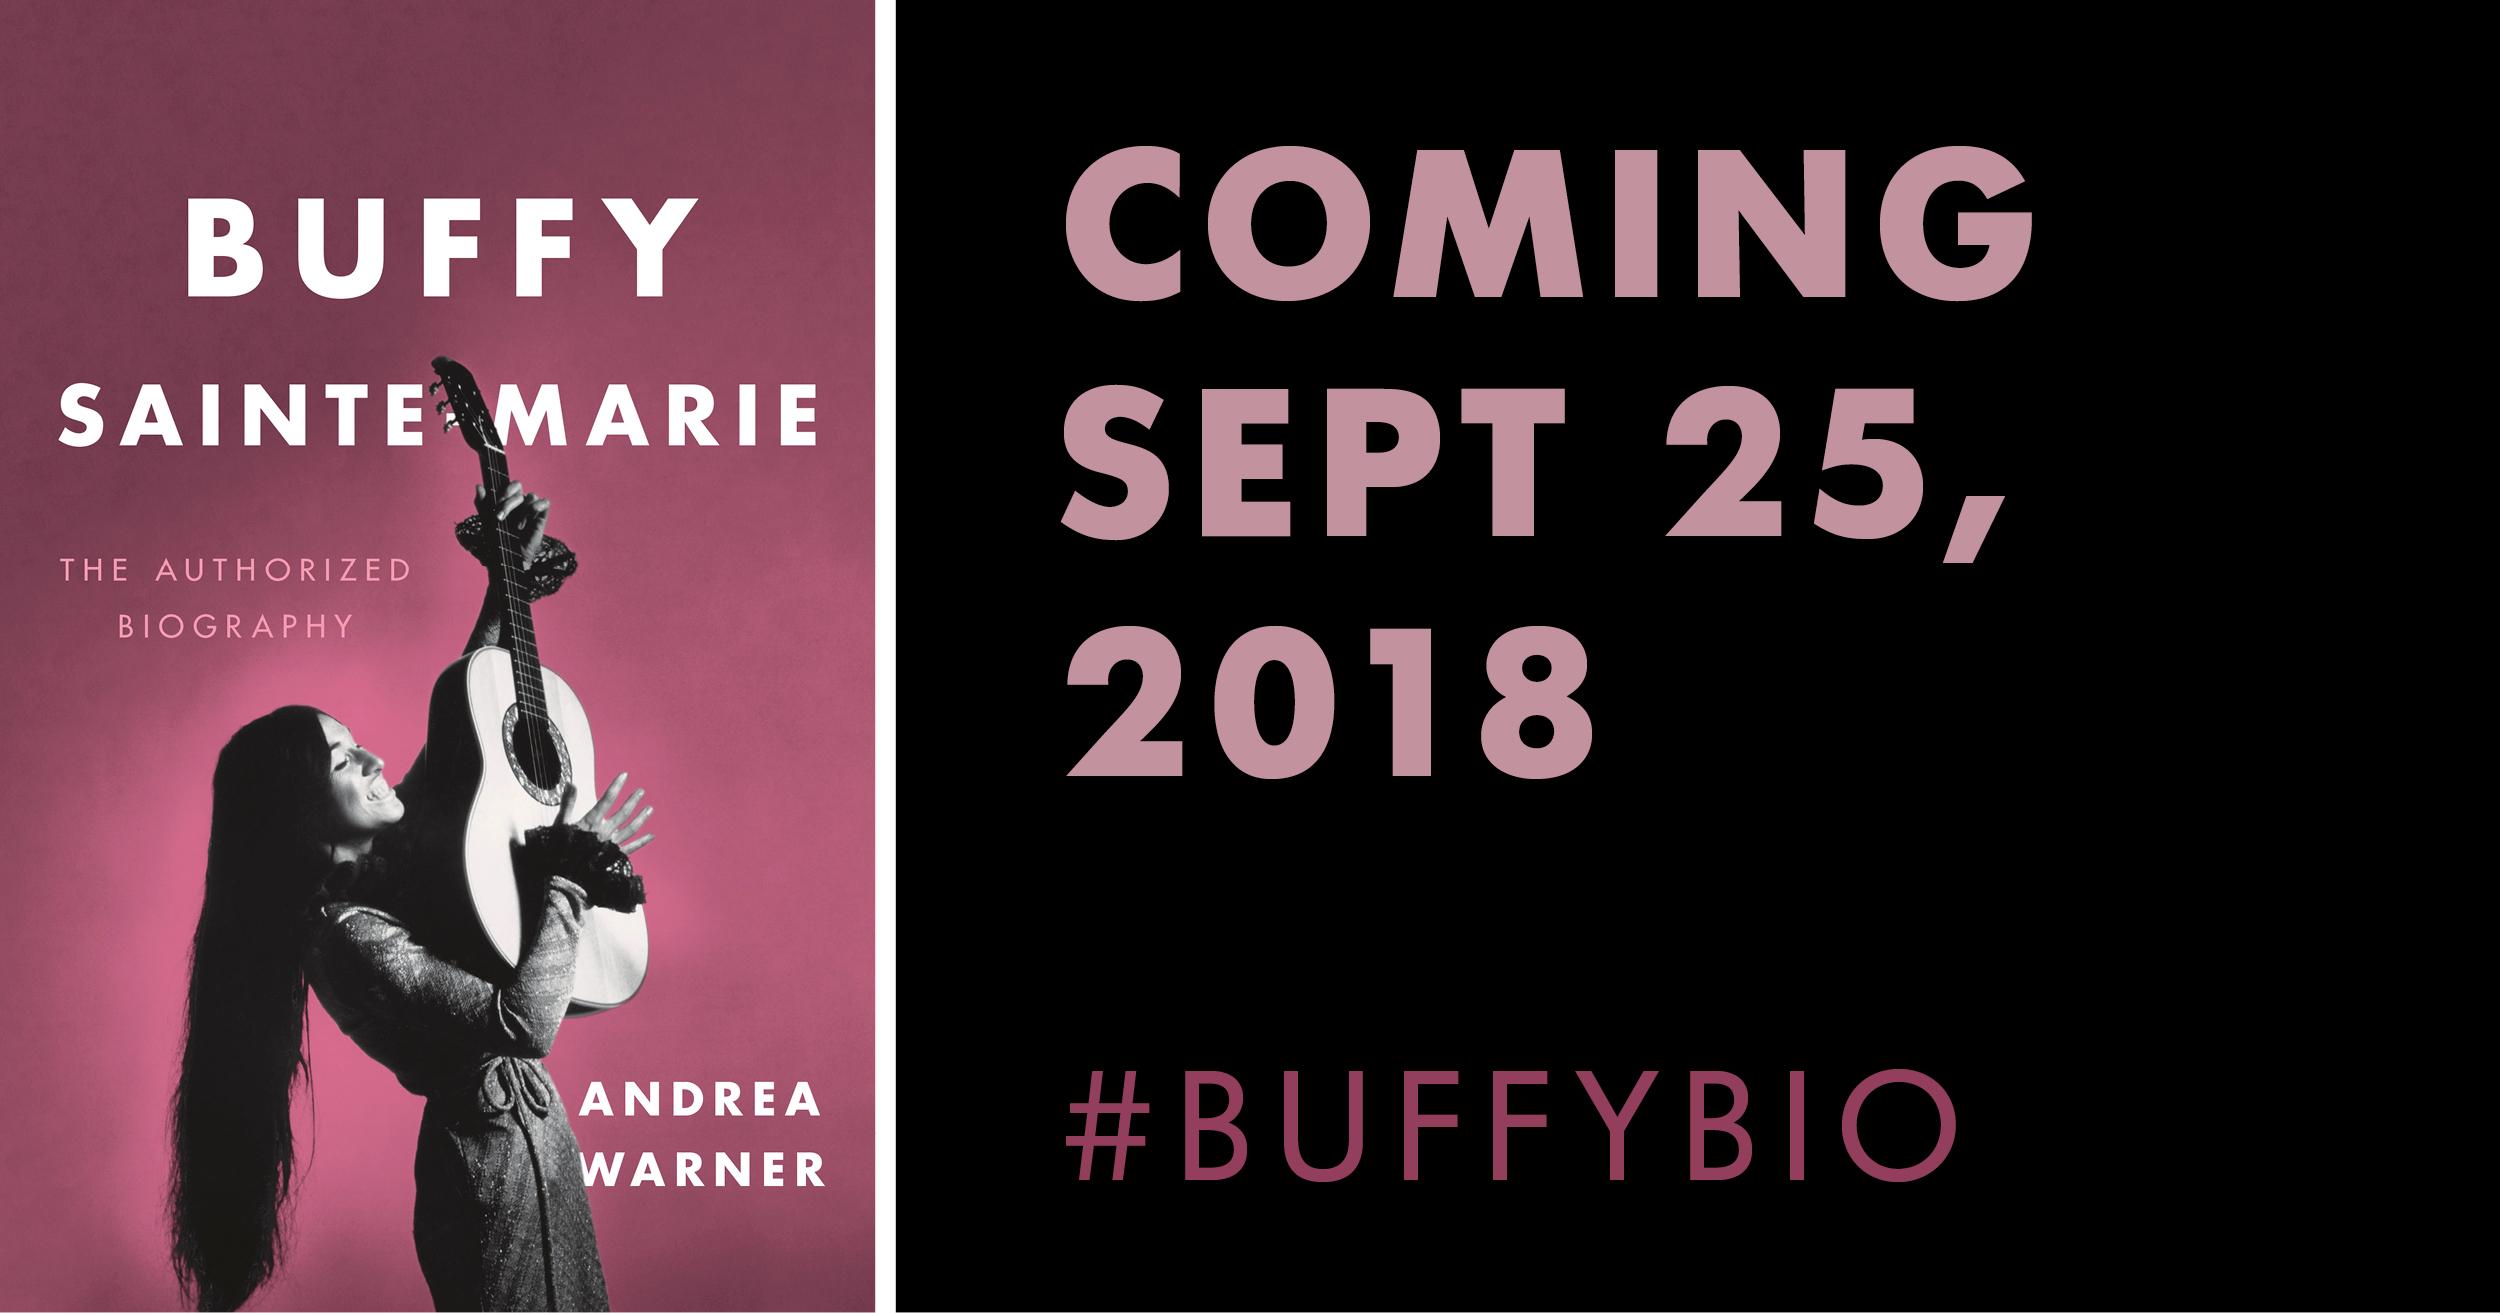 Buffy_Facebook2.jpg